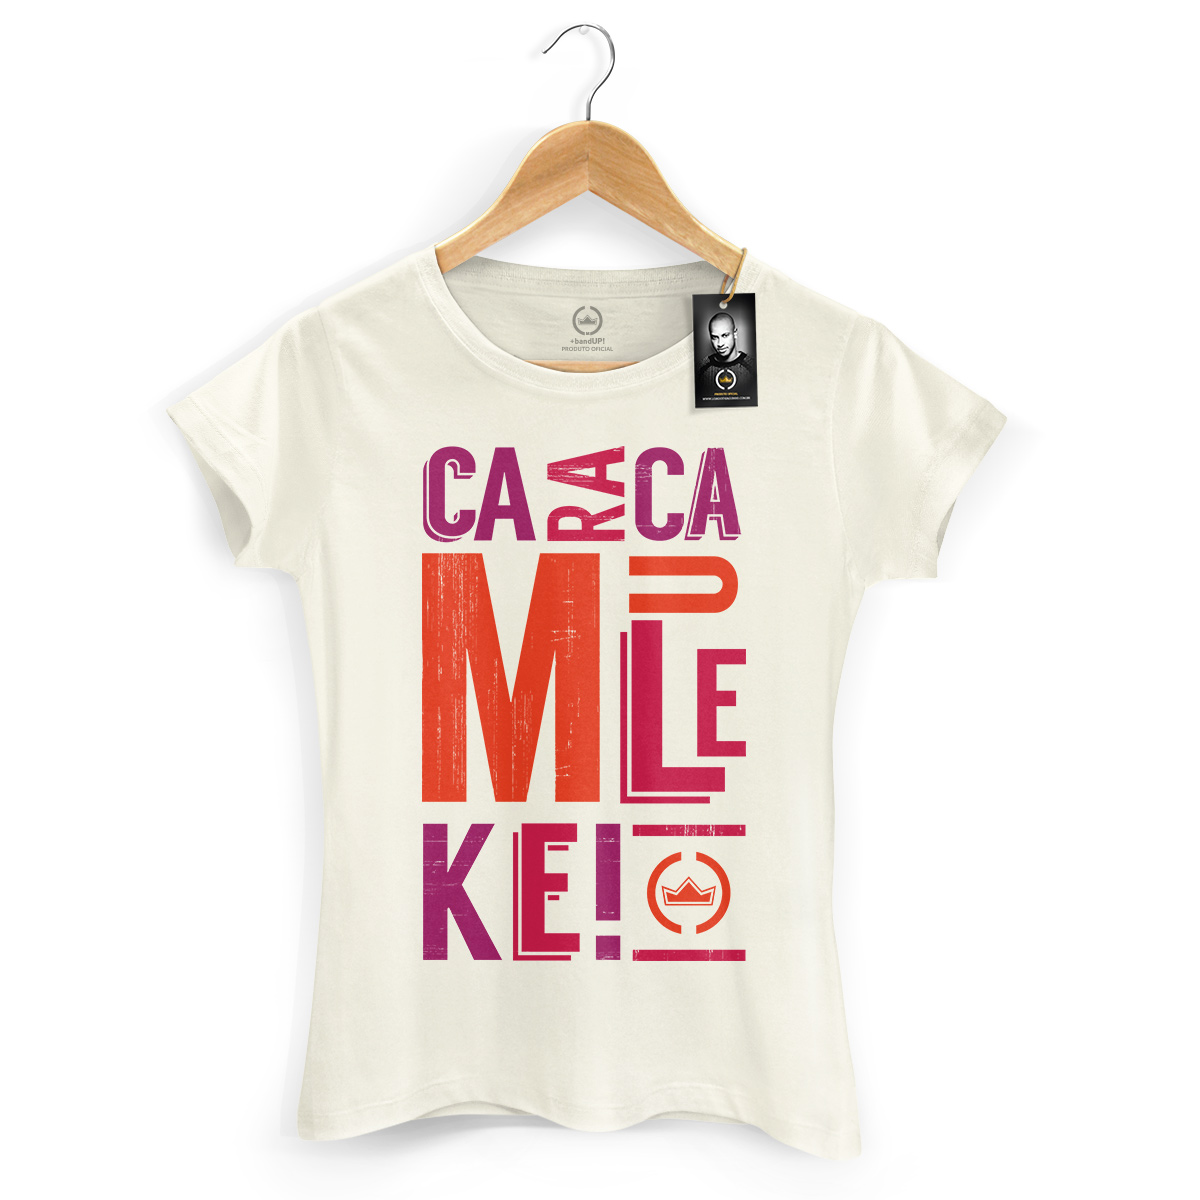 Camiseta Feminina Thiaguinho Caraca Muleke! 2